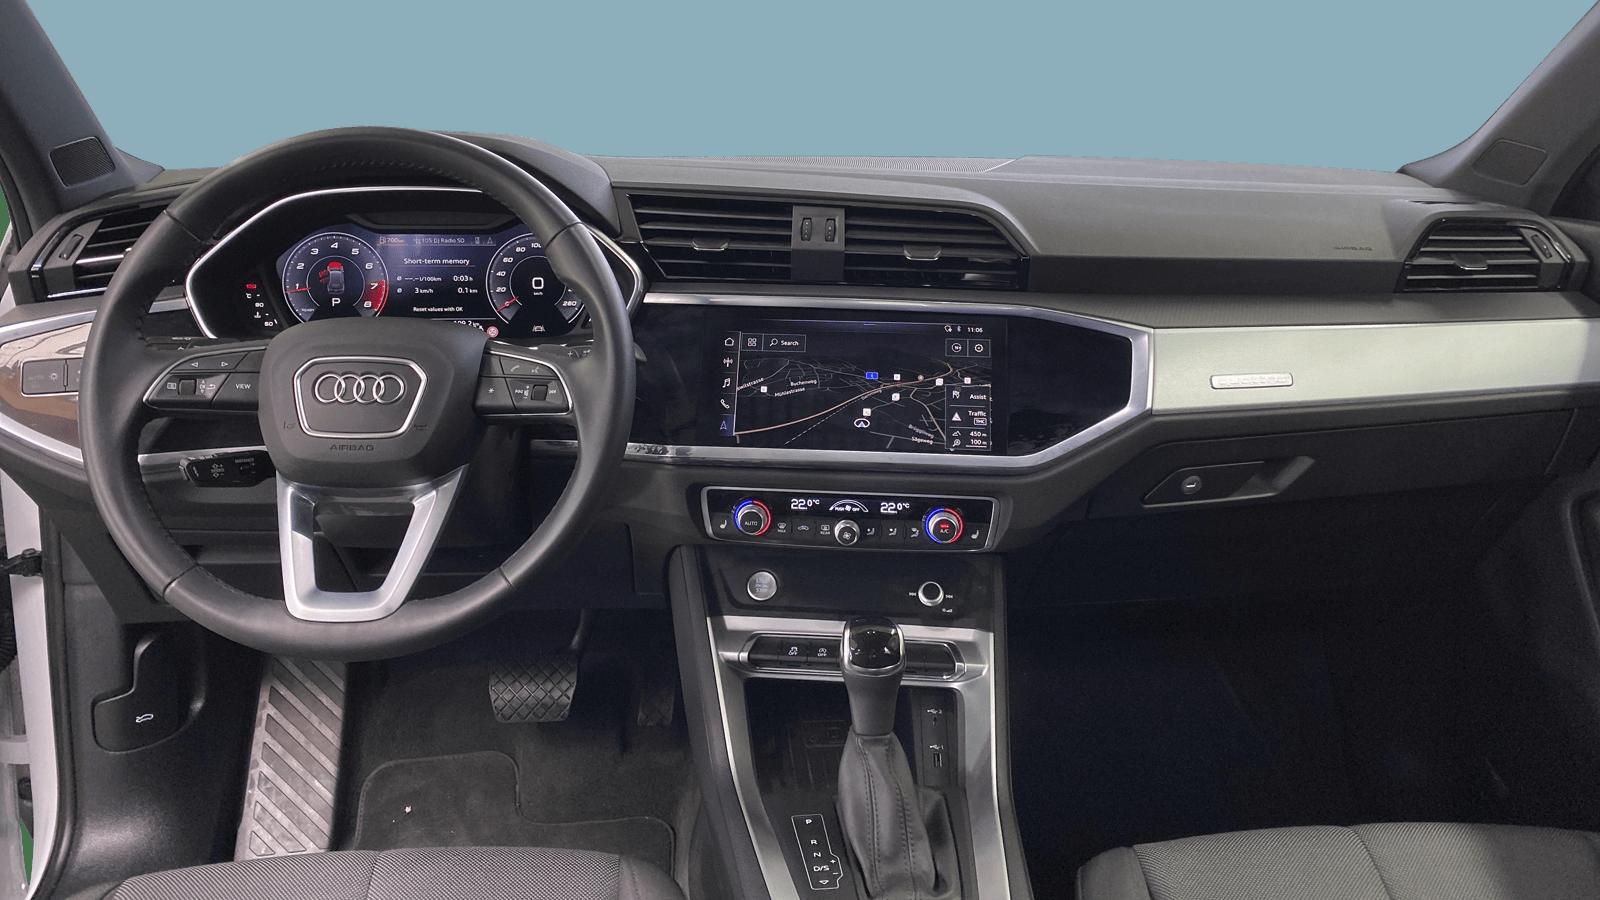 Audi Q3 White interior - Clyde car subscription